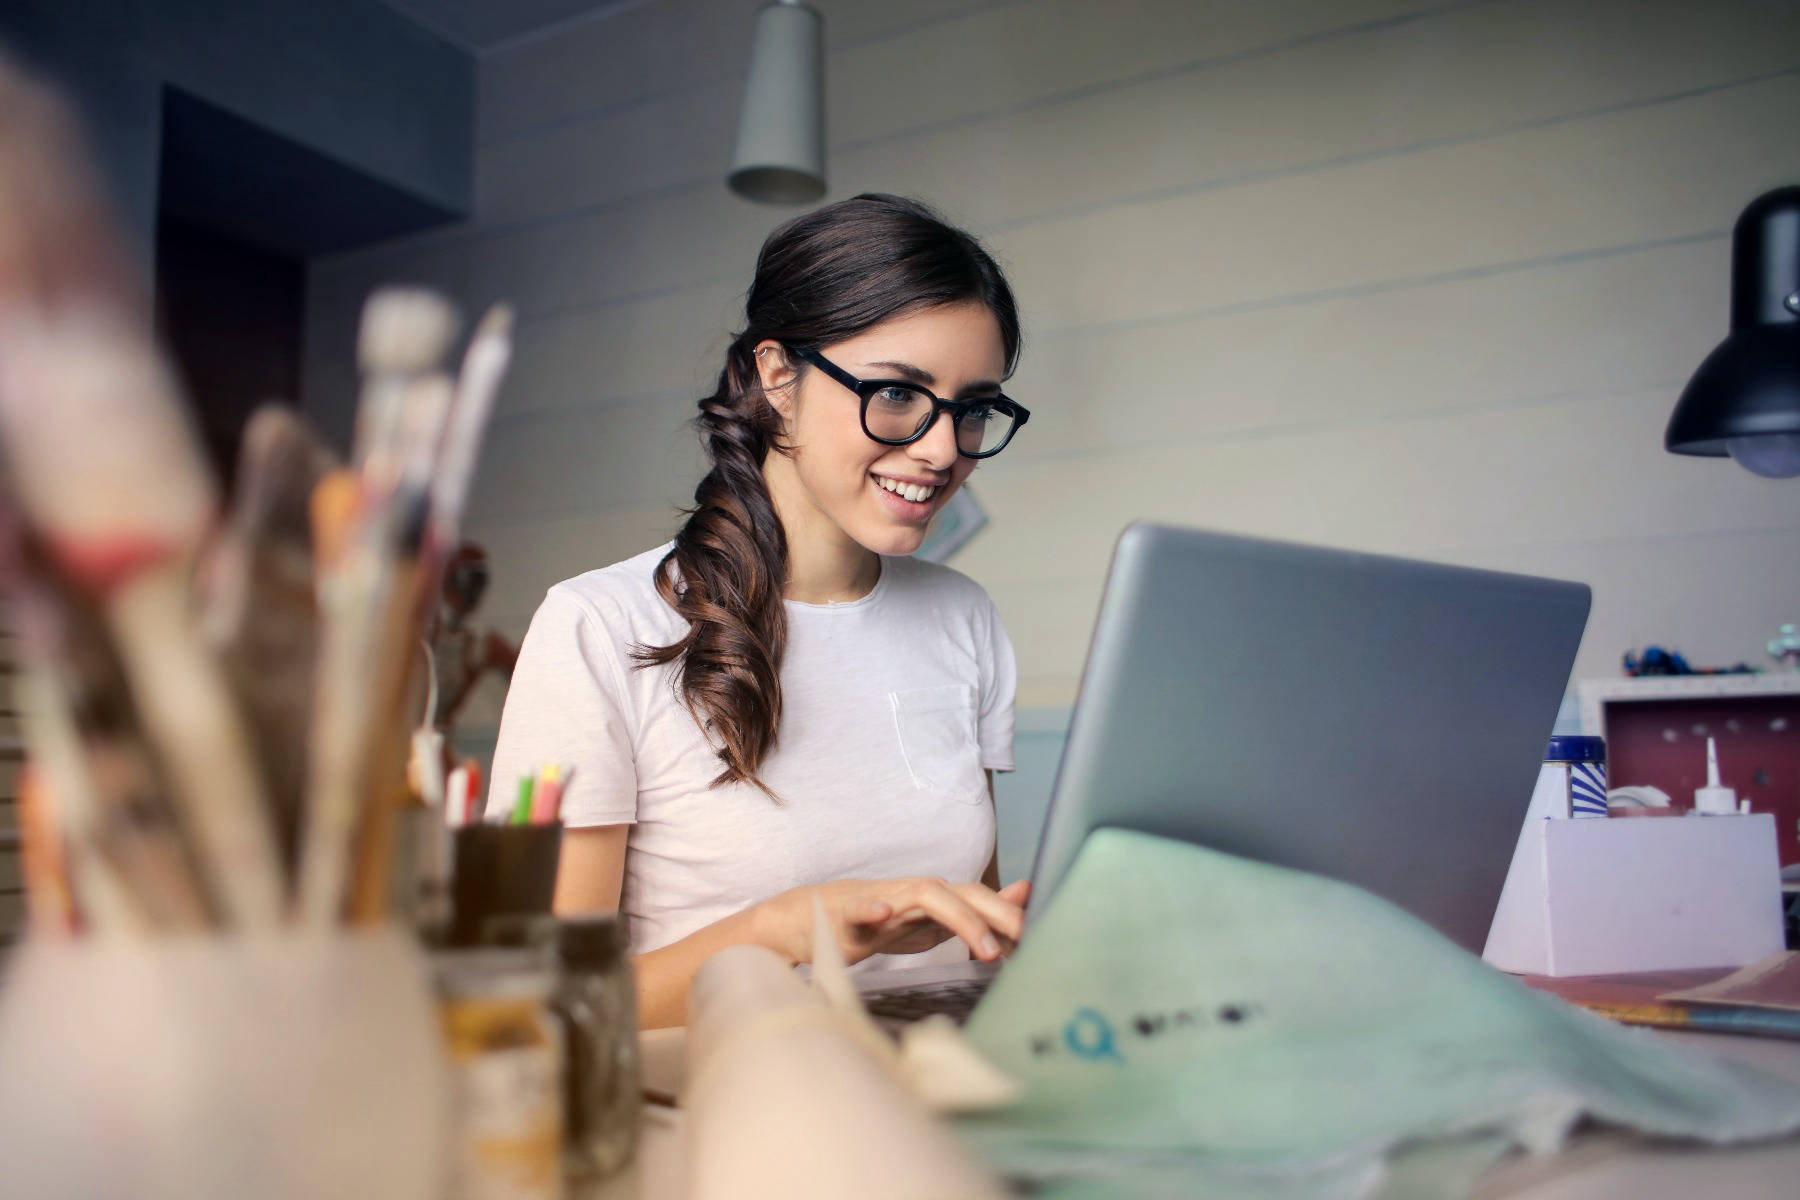 Woman studying online via laptop